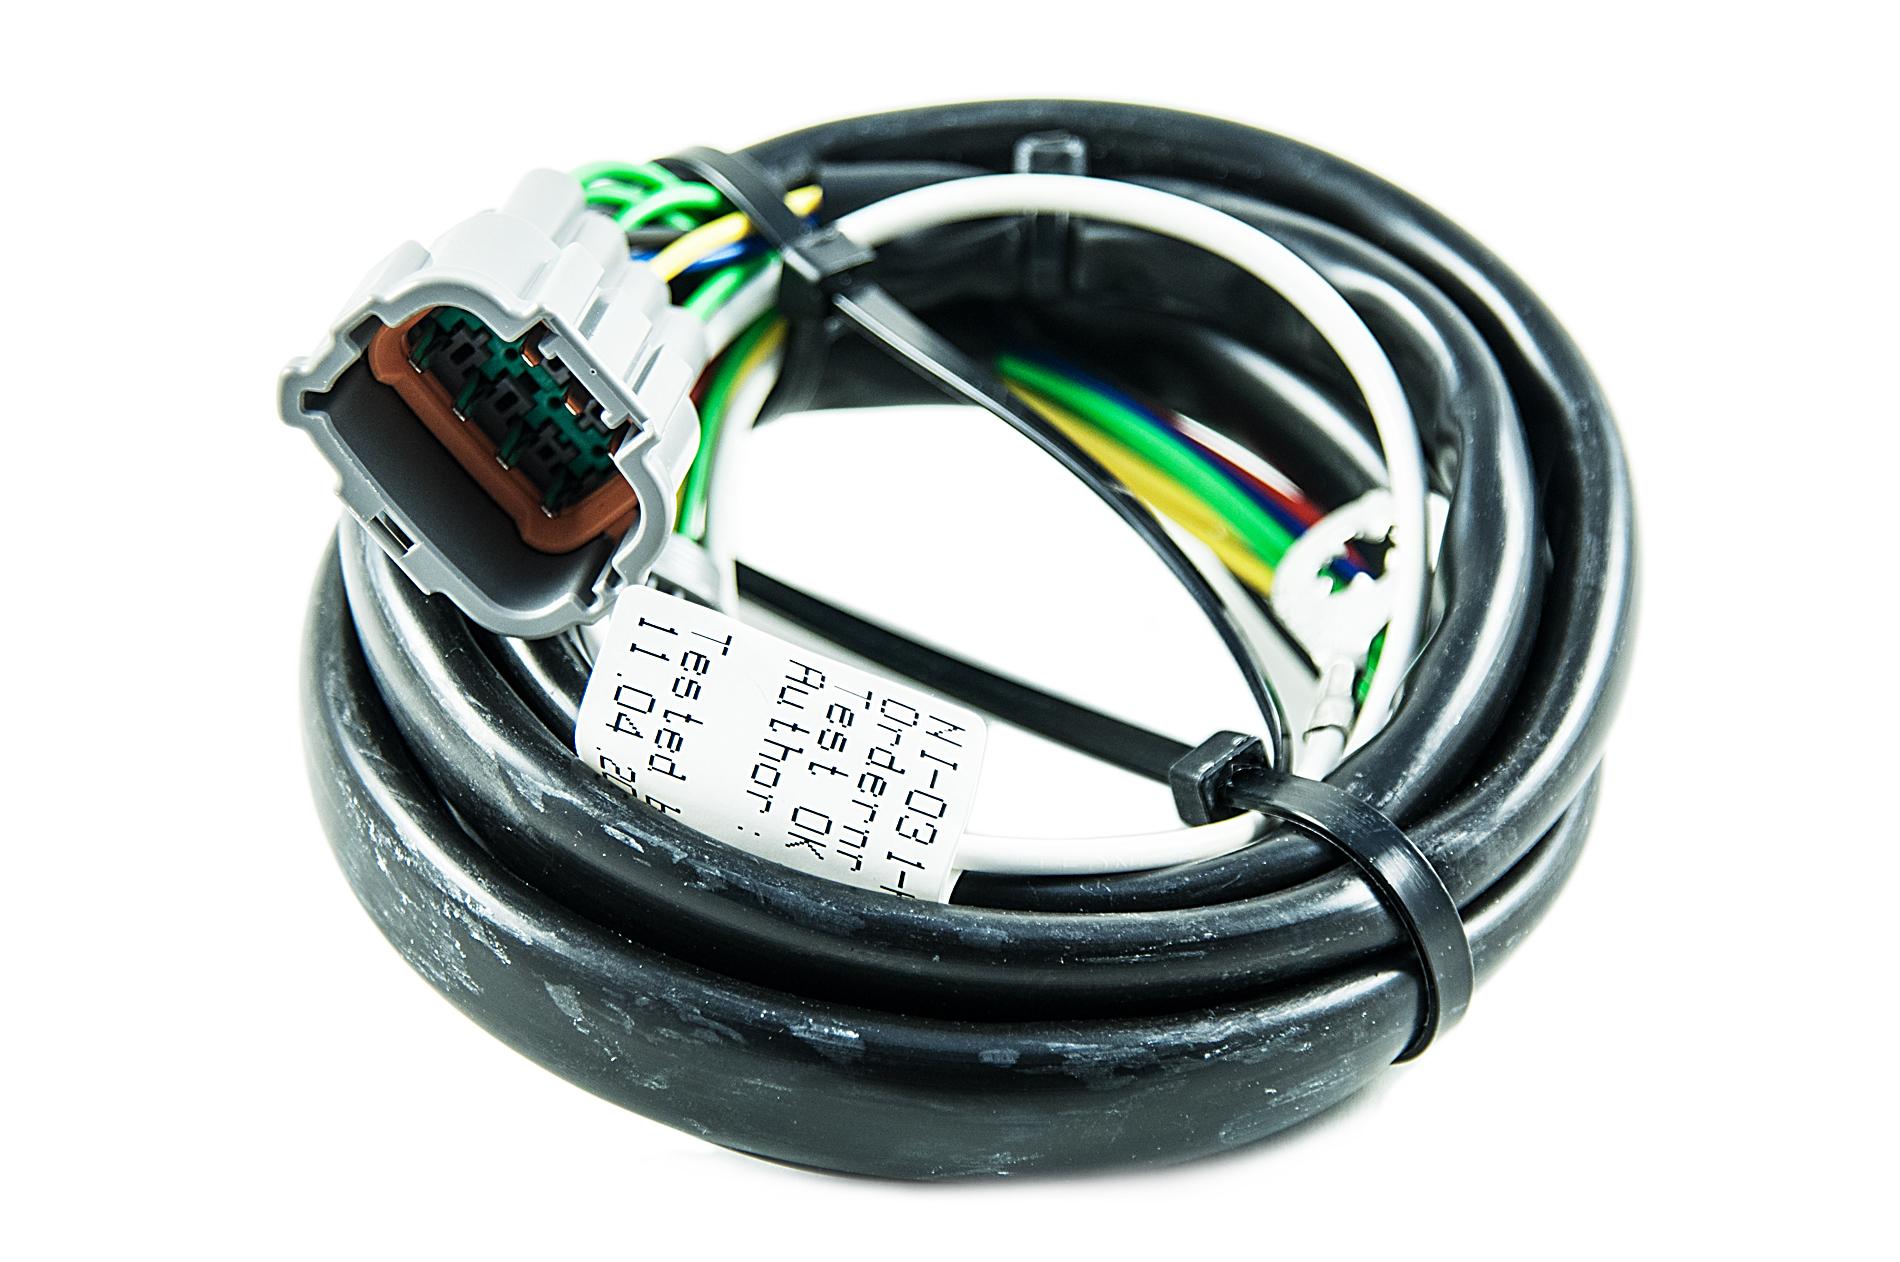 nissan navara towbar wiring diagram vw tiguan radio genuine electrical kit for tow bar